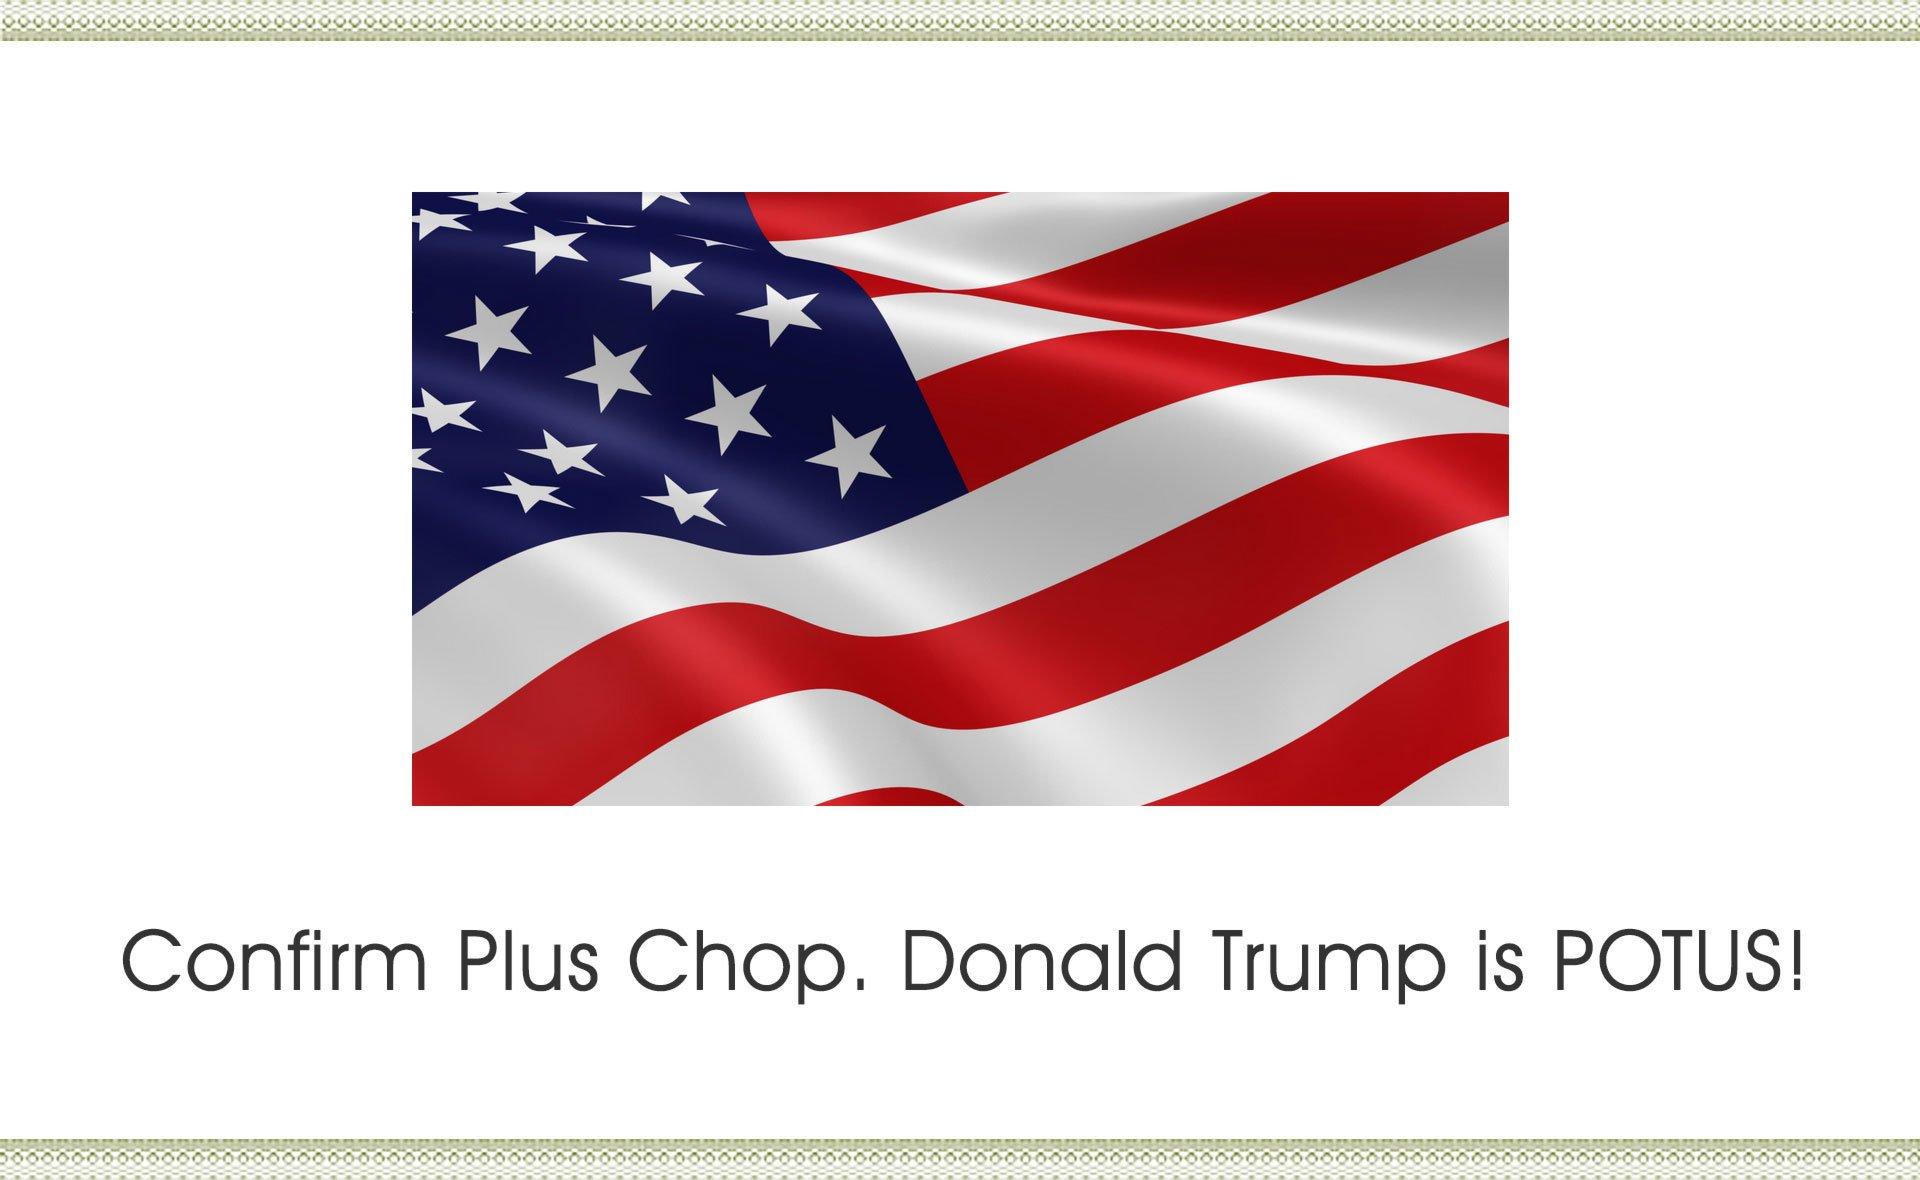 Confirm Plus Chop. Donald Trump is POTUS!